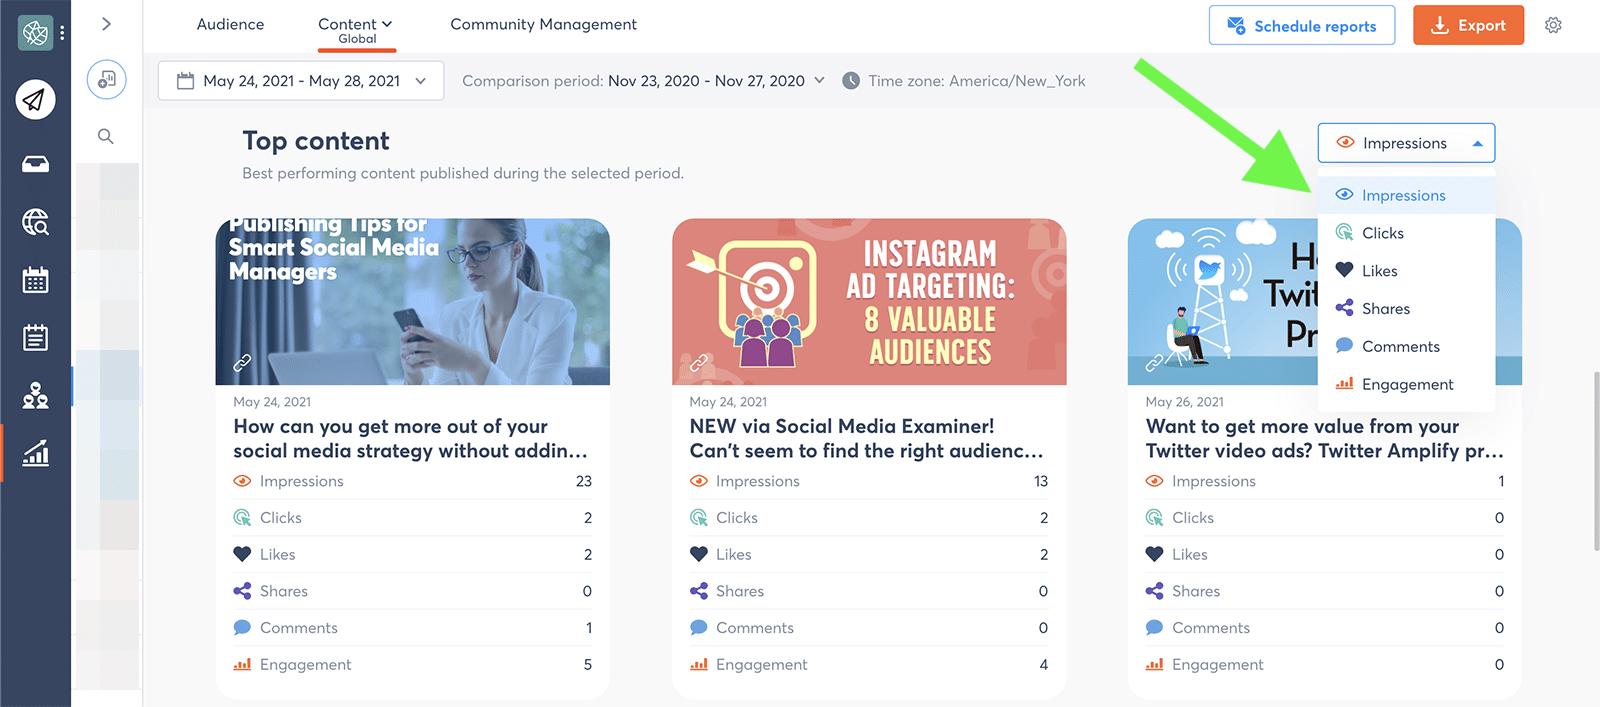 LinkedIn metrics - top content